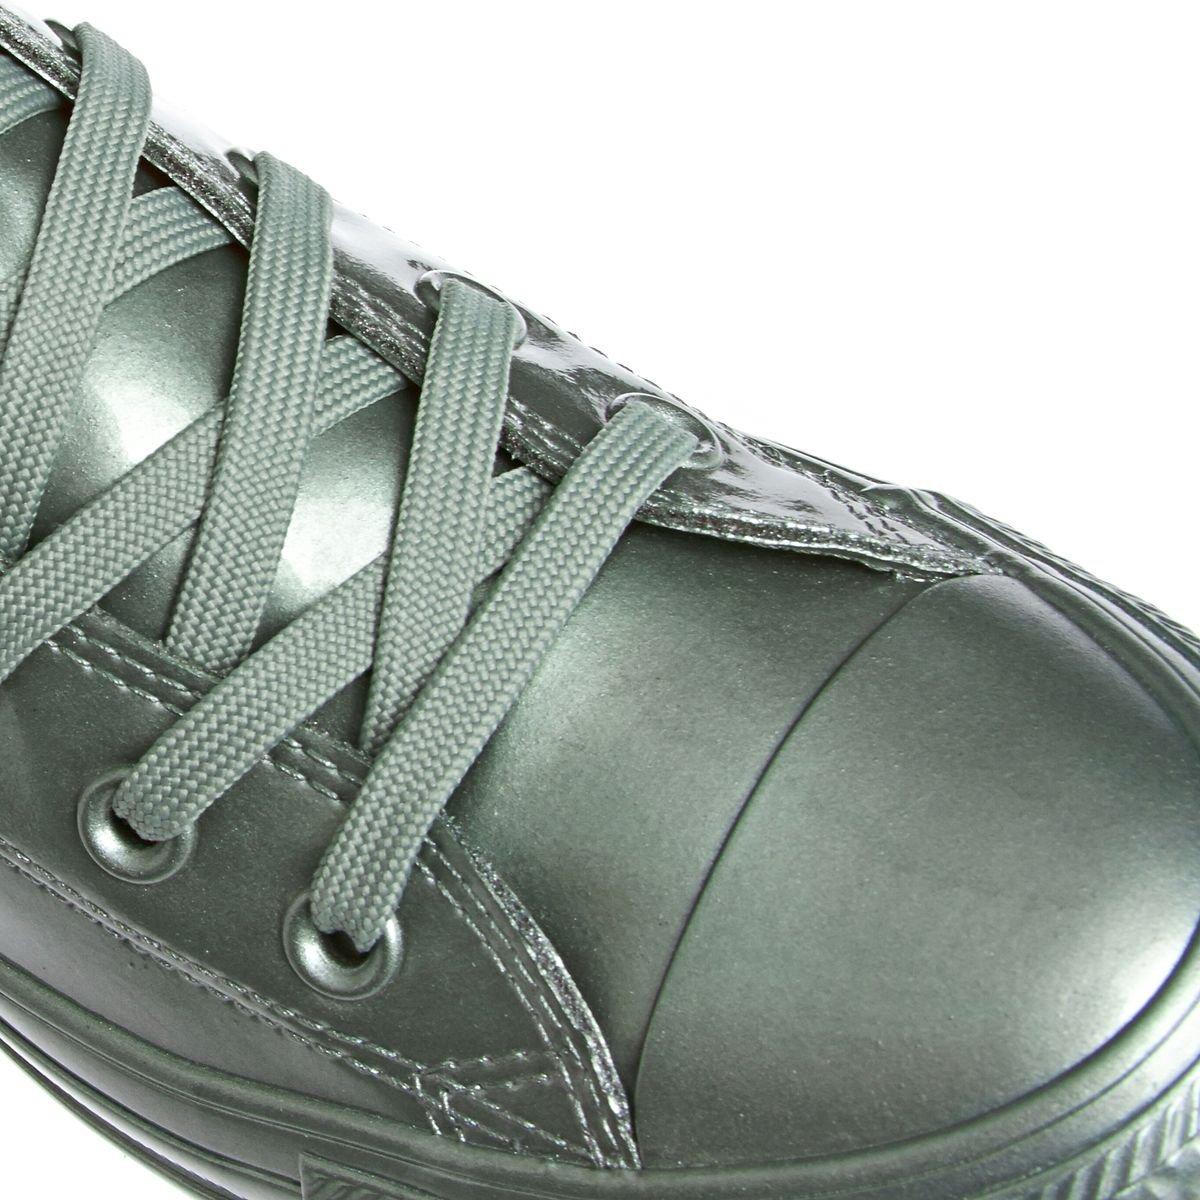 Converse AS Hi Unisex-Erwachsene Can charcoal 1J793 Unisex-Erwachsene Hi Sneaker Silber 072dd9